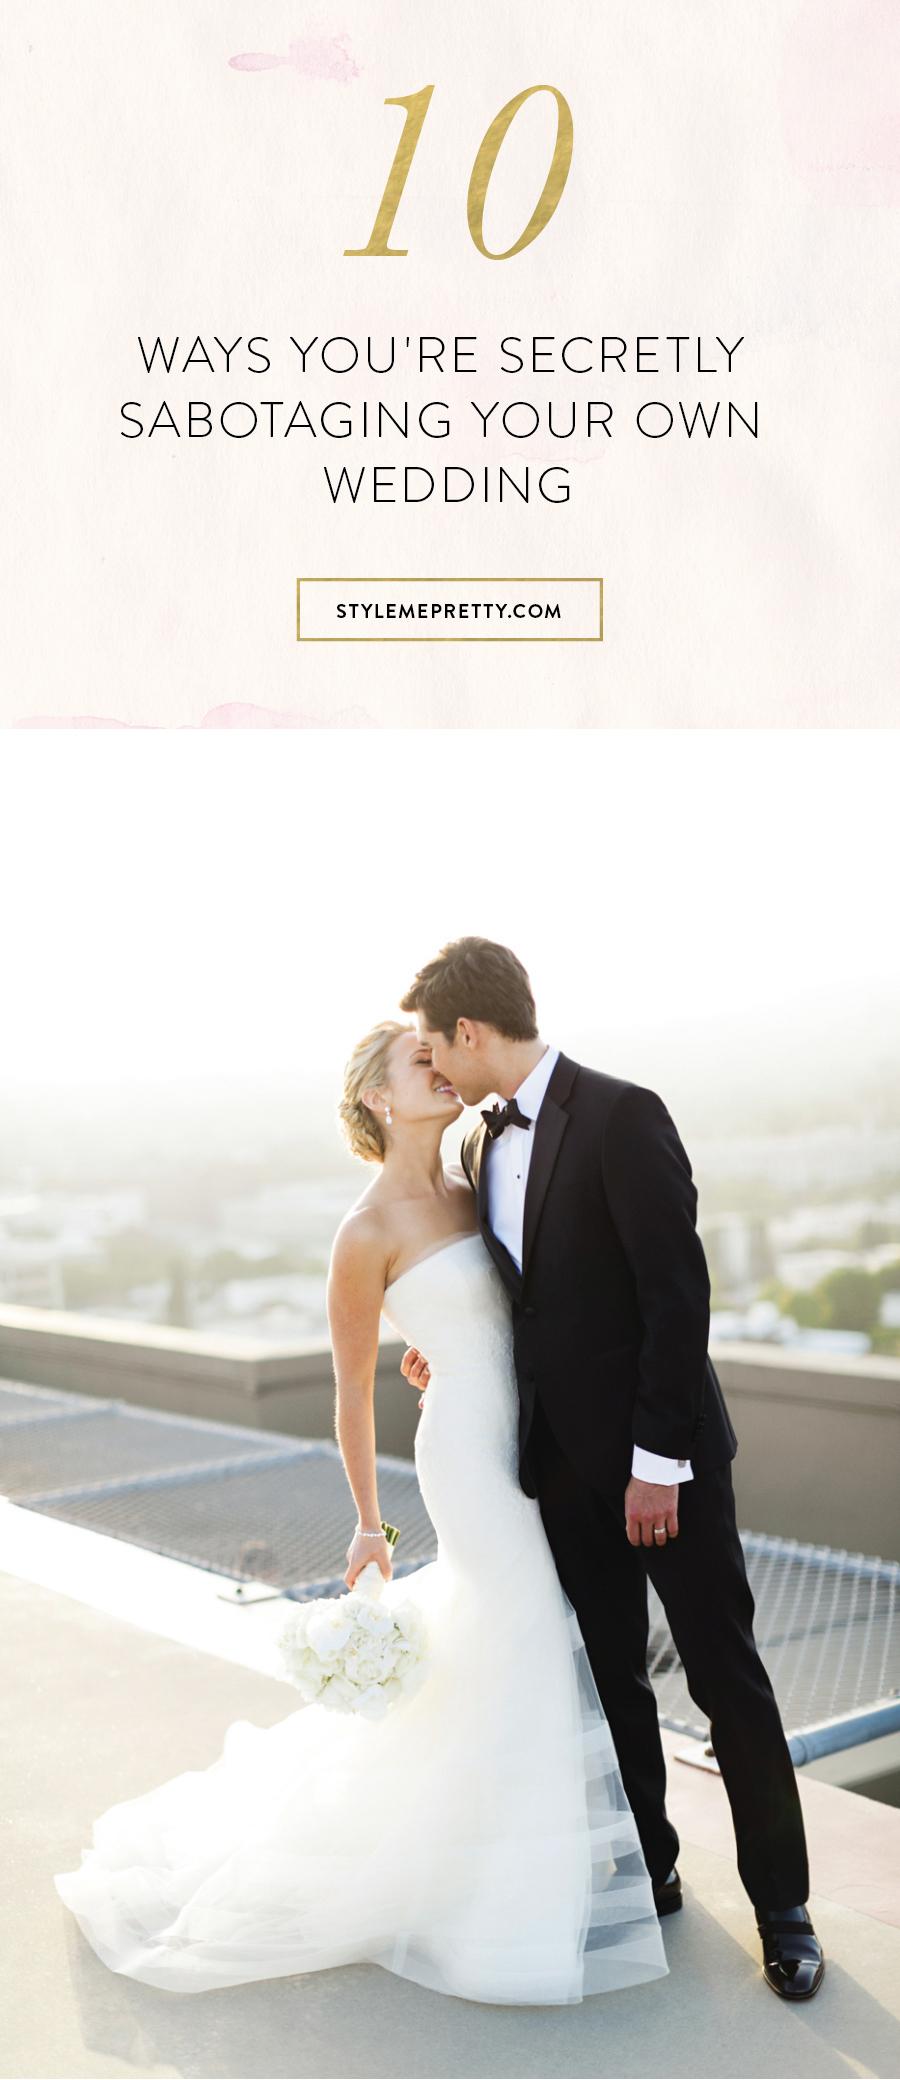 PInterest_Text_Overlay_3_Weddings-05.jpg